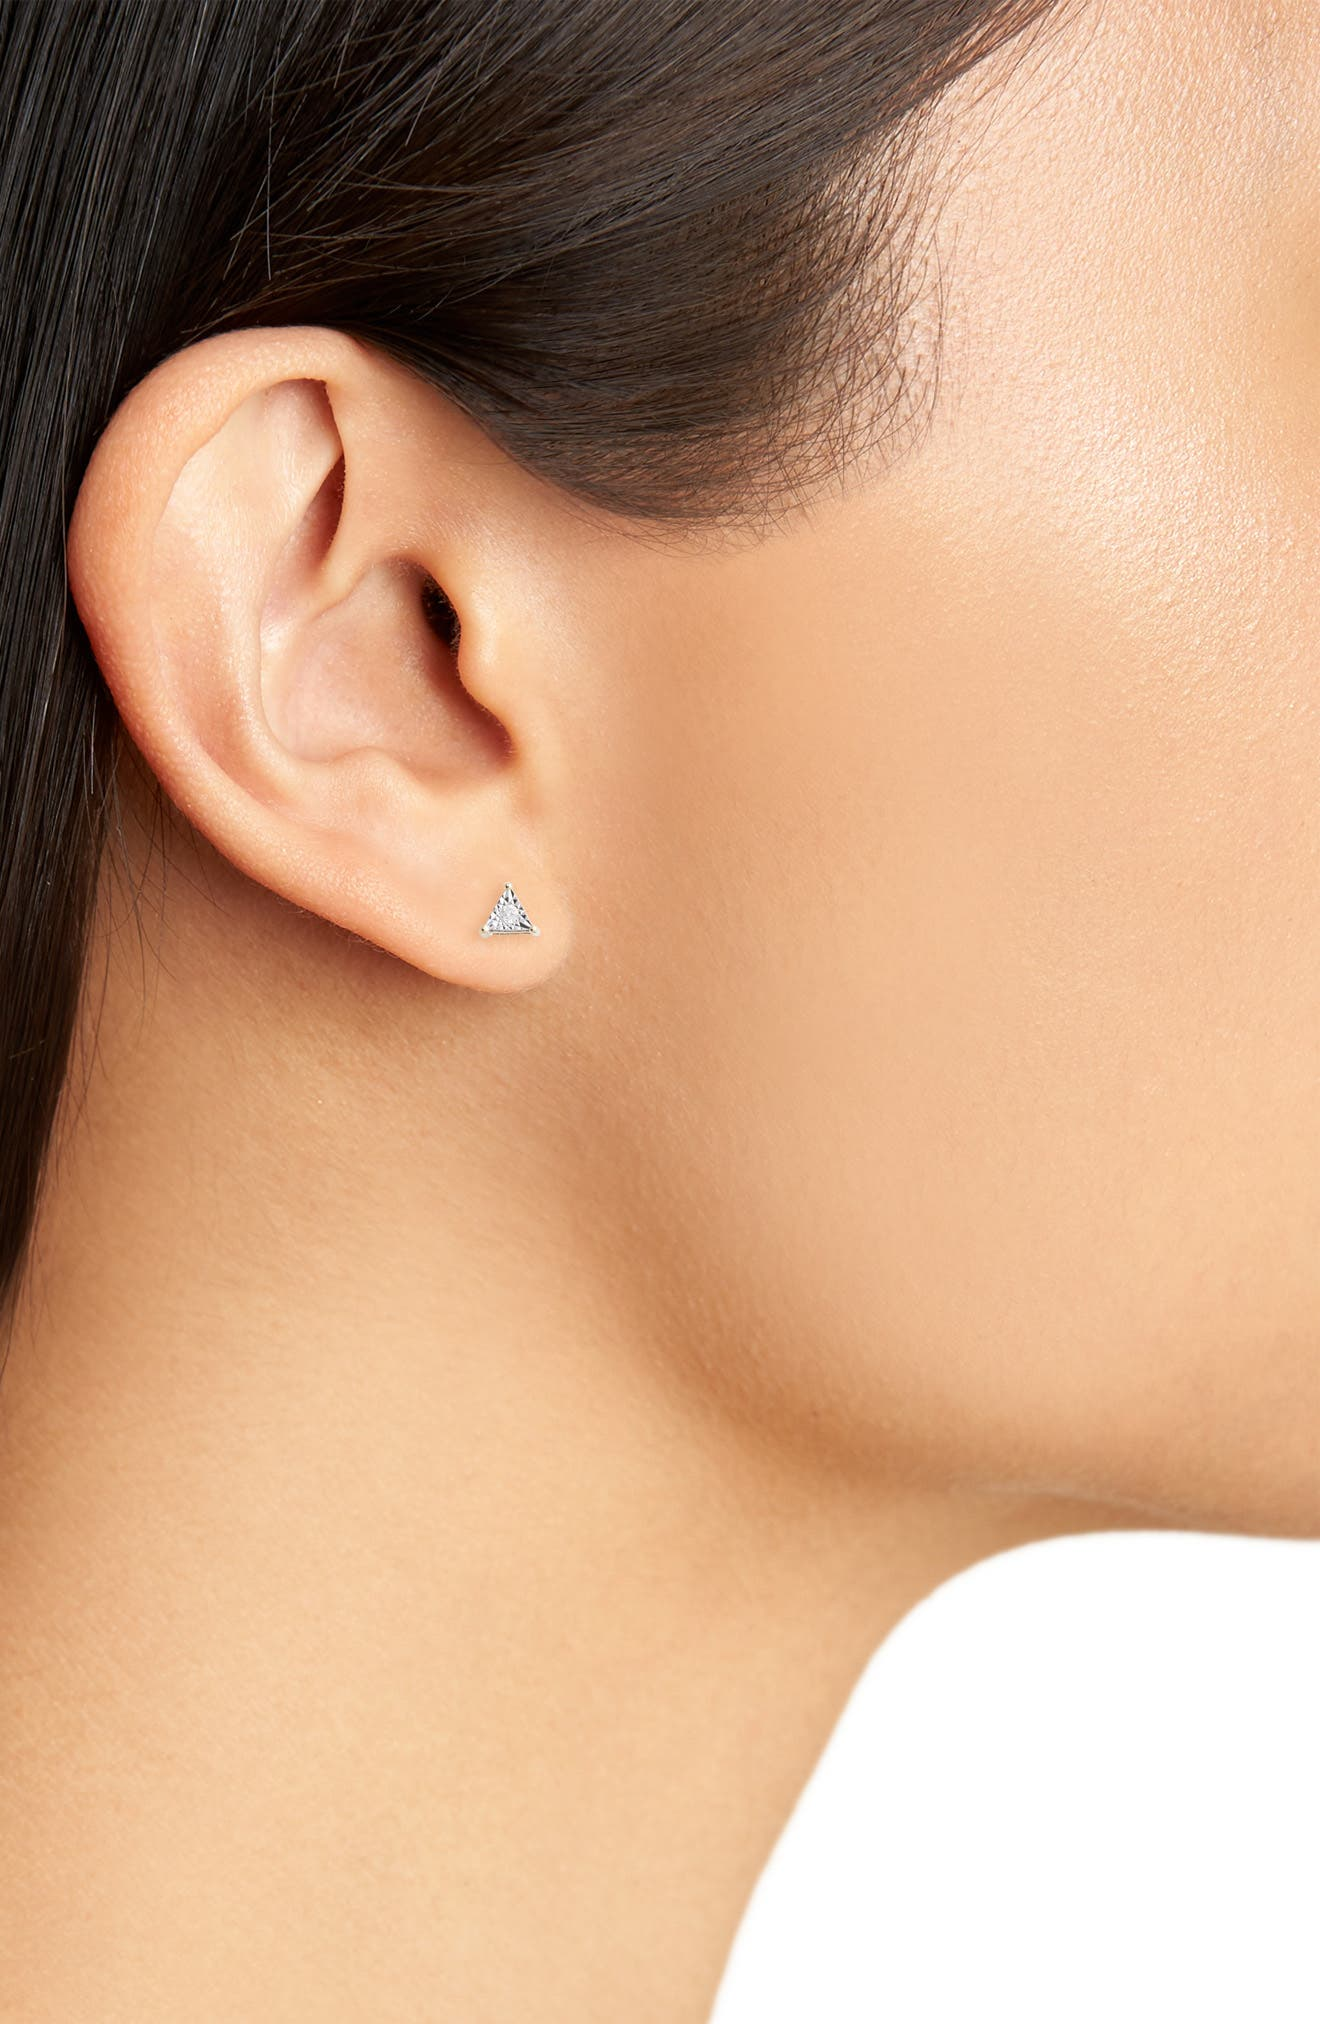 Emily Sarah Diamond Triangle Stud Earrings,                             Alternate thumbnail 2, color,                             YELLOW GOLD/ DIAMOND